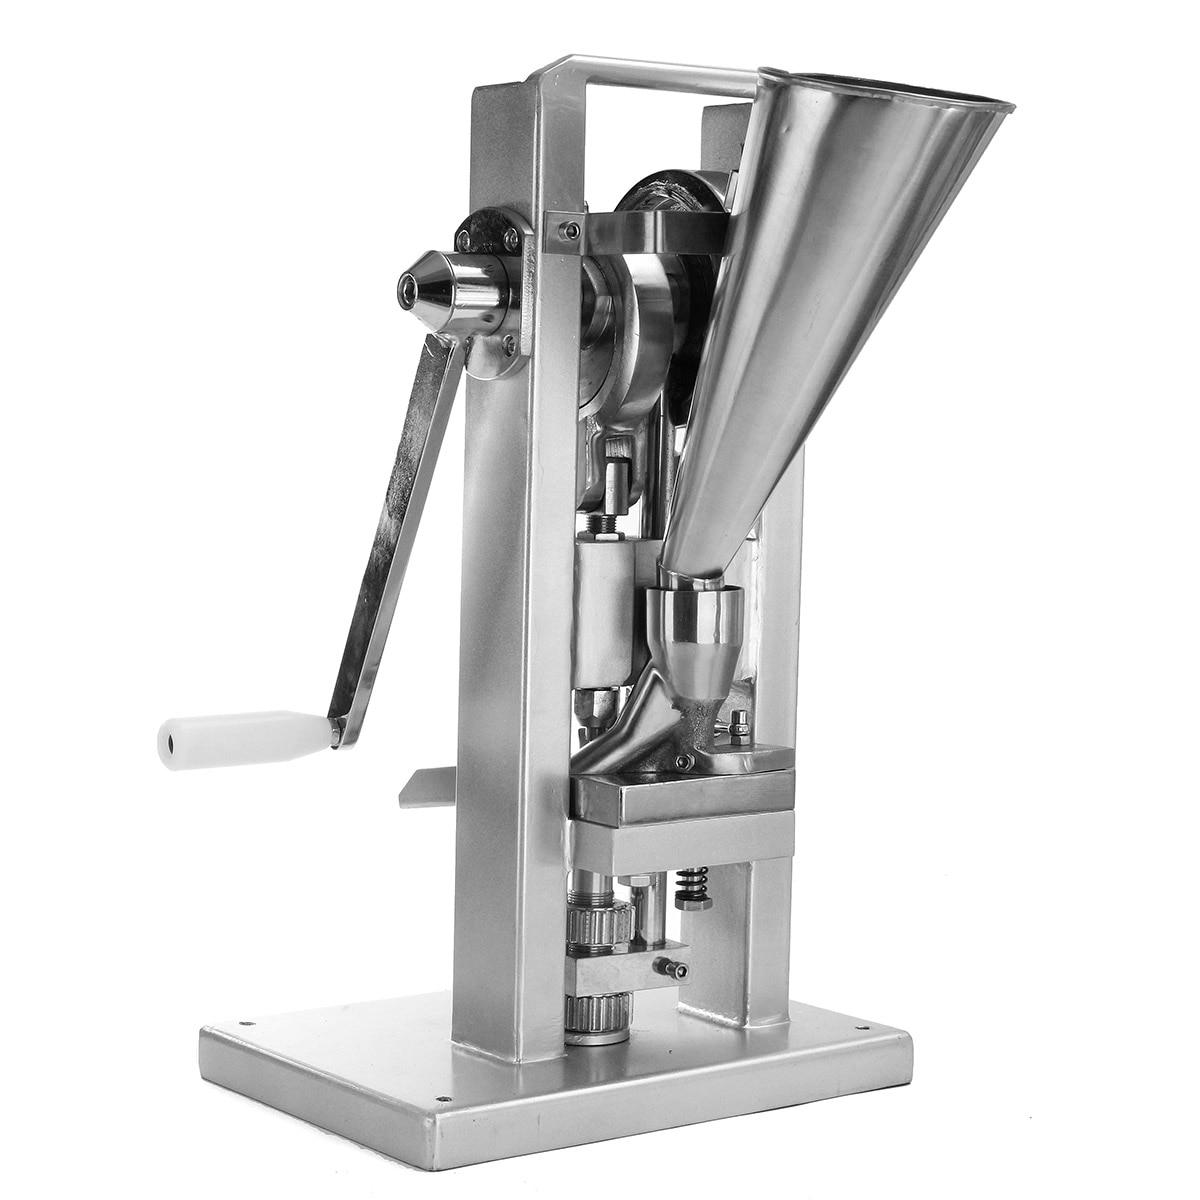 Prensa para comprimidos simples manual/para confecção de comprimidos/(tipo mais leve) TDP-0/manual/mini-tipo 20 kg